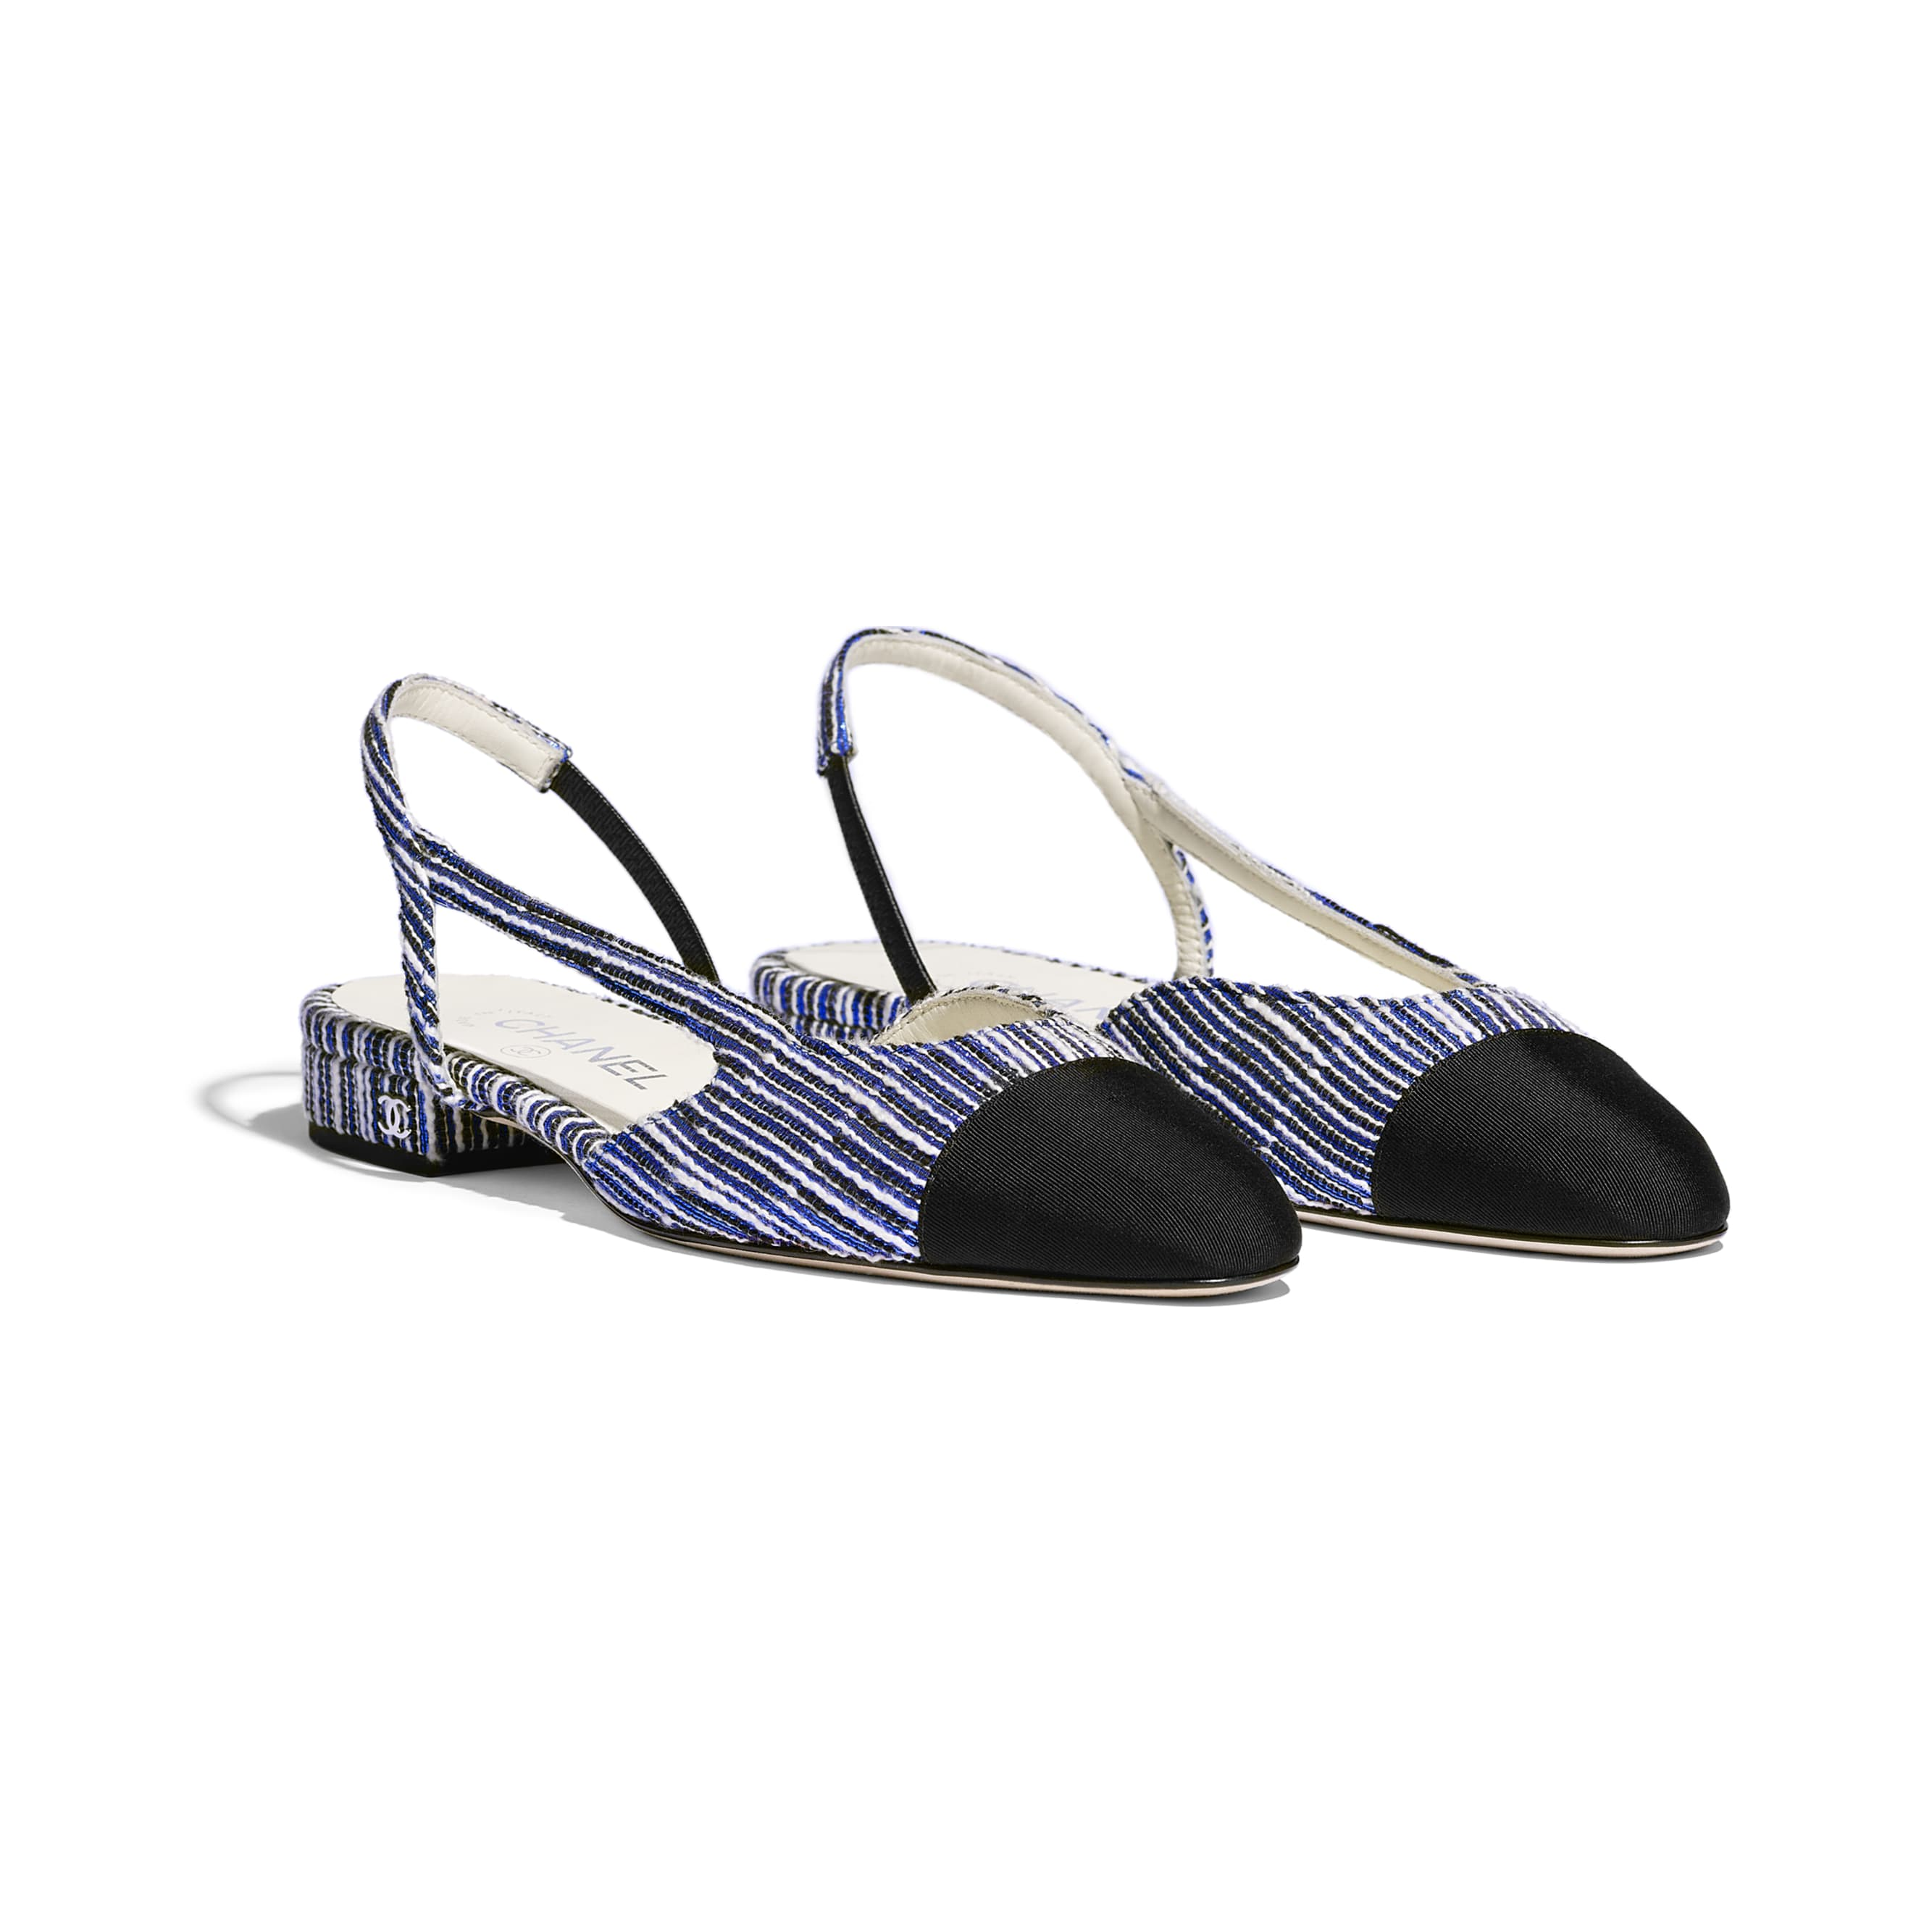 Slingbacks - White, Blue, Silver & Black - Tweed & Grosgrain - Alternative view - see standard sized version